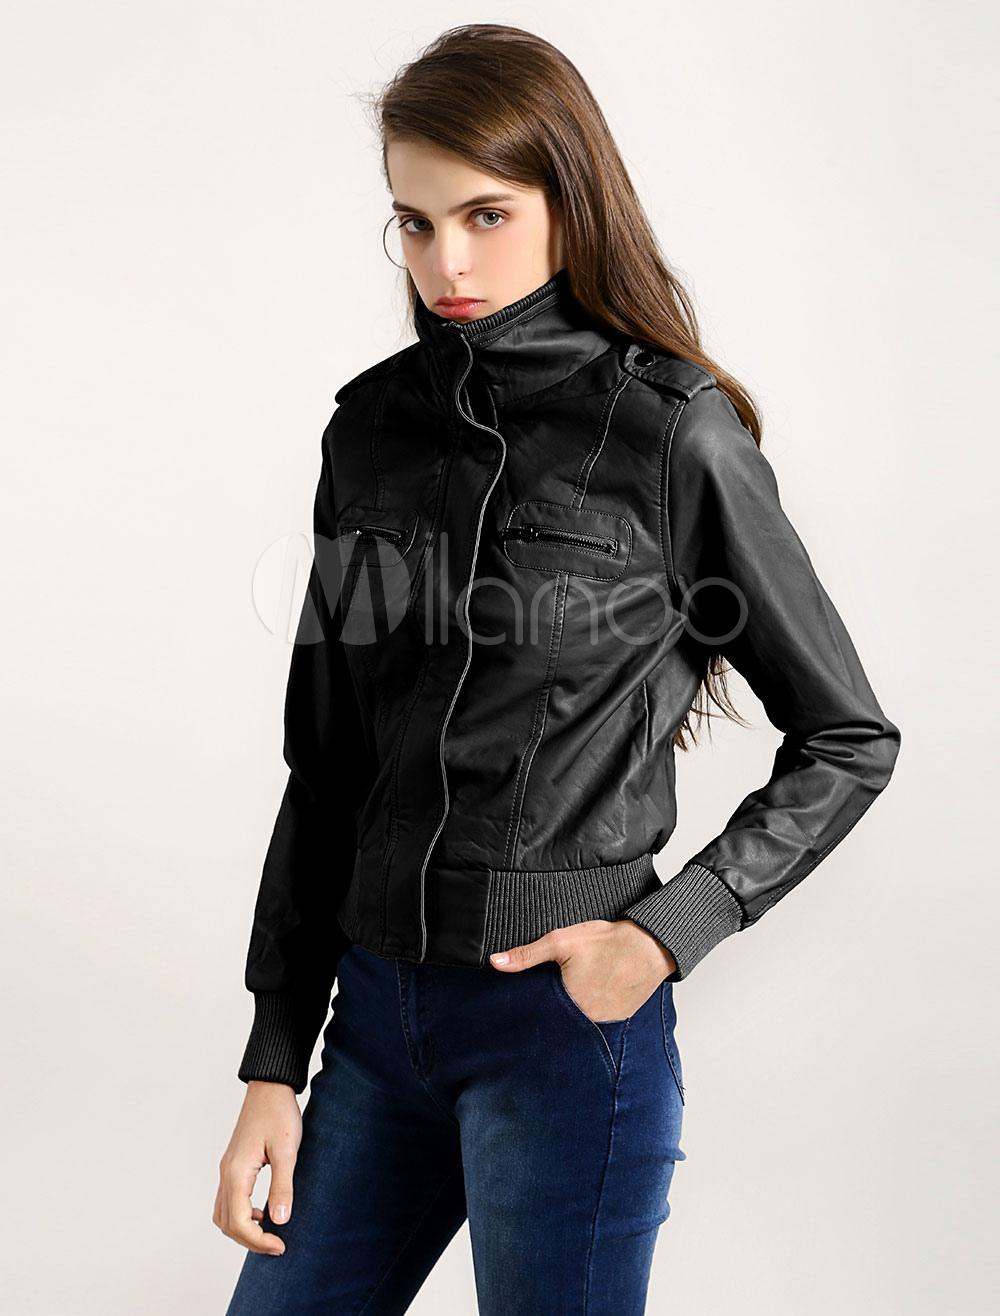 Buy Women Leather Jacket Black Motorcycle Jacket Long Sleeve Zipper Biker Jacket for $29.99 in Milanoo store